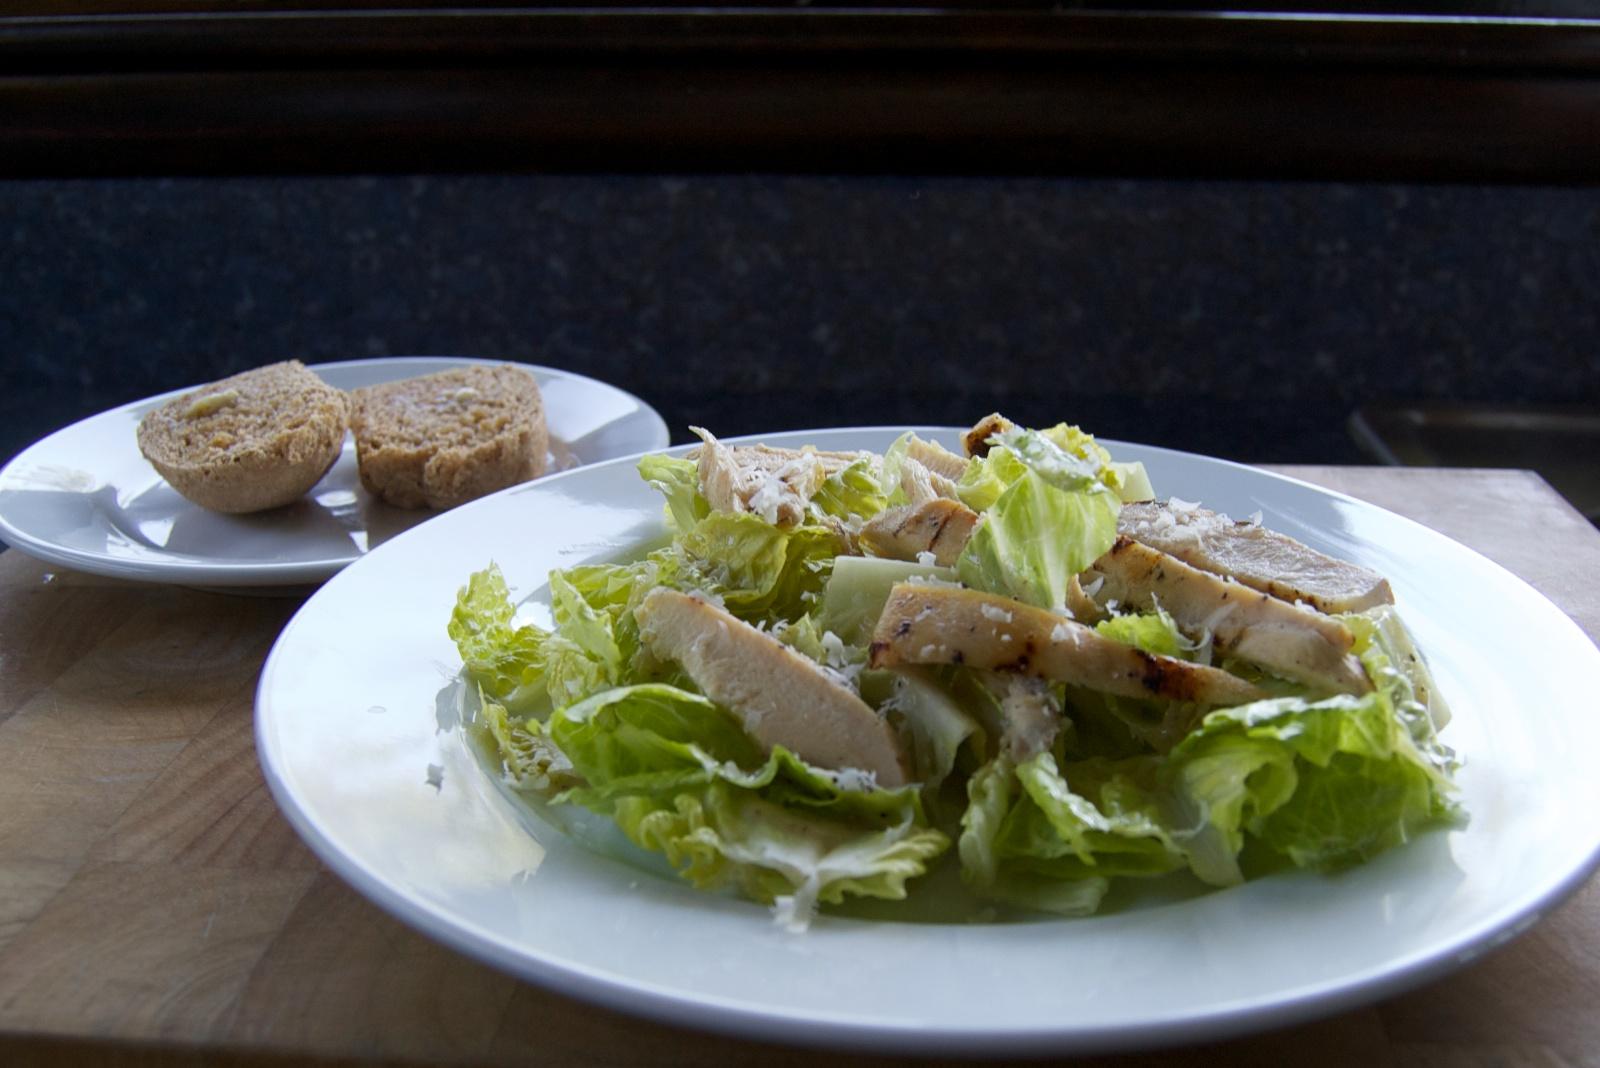 http://blog.rickk.com/food/2012/05/17/ate.2012.05.17.l.jpg